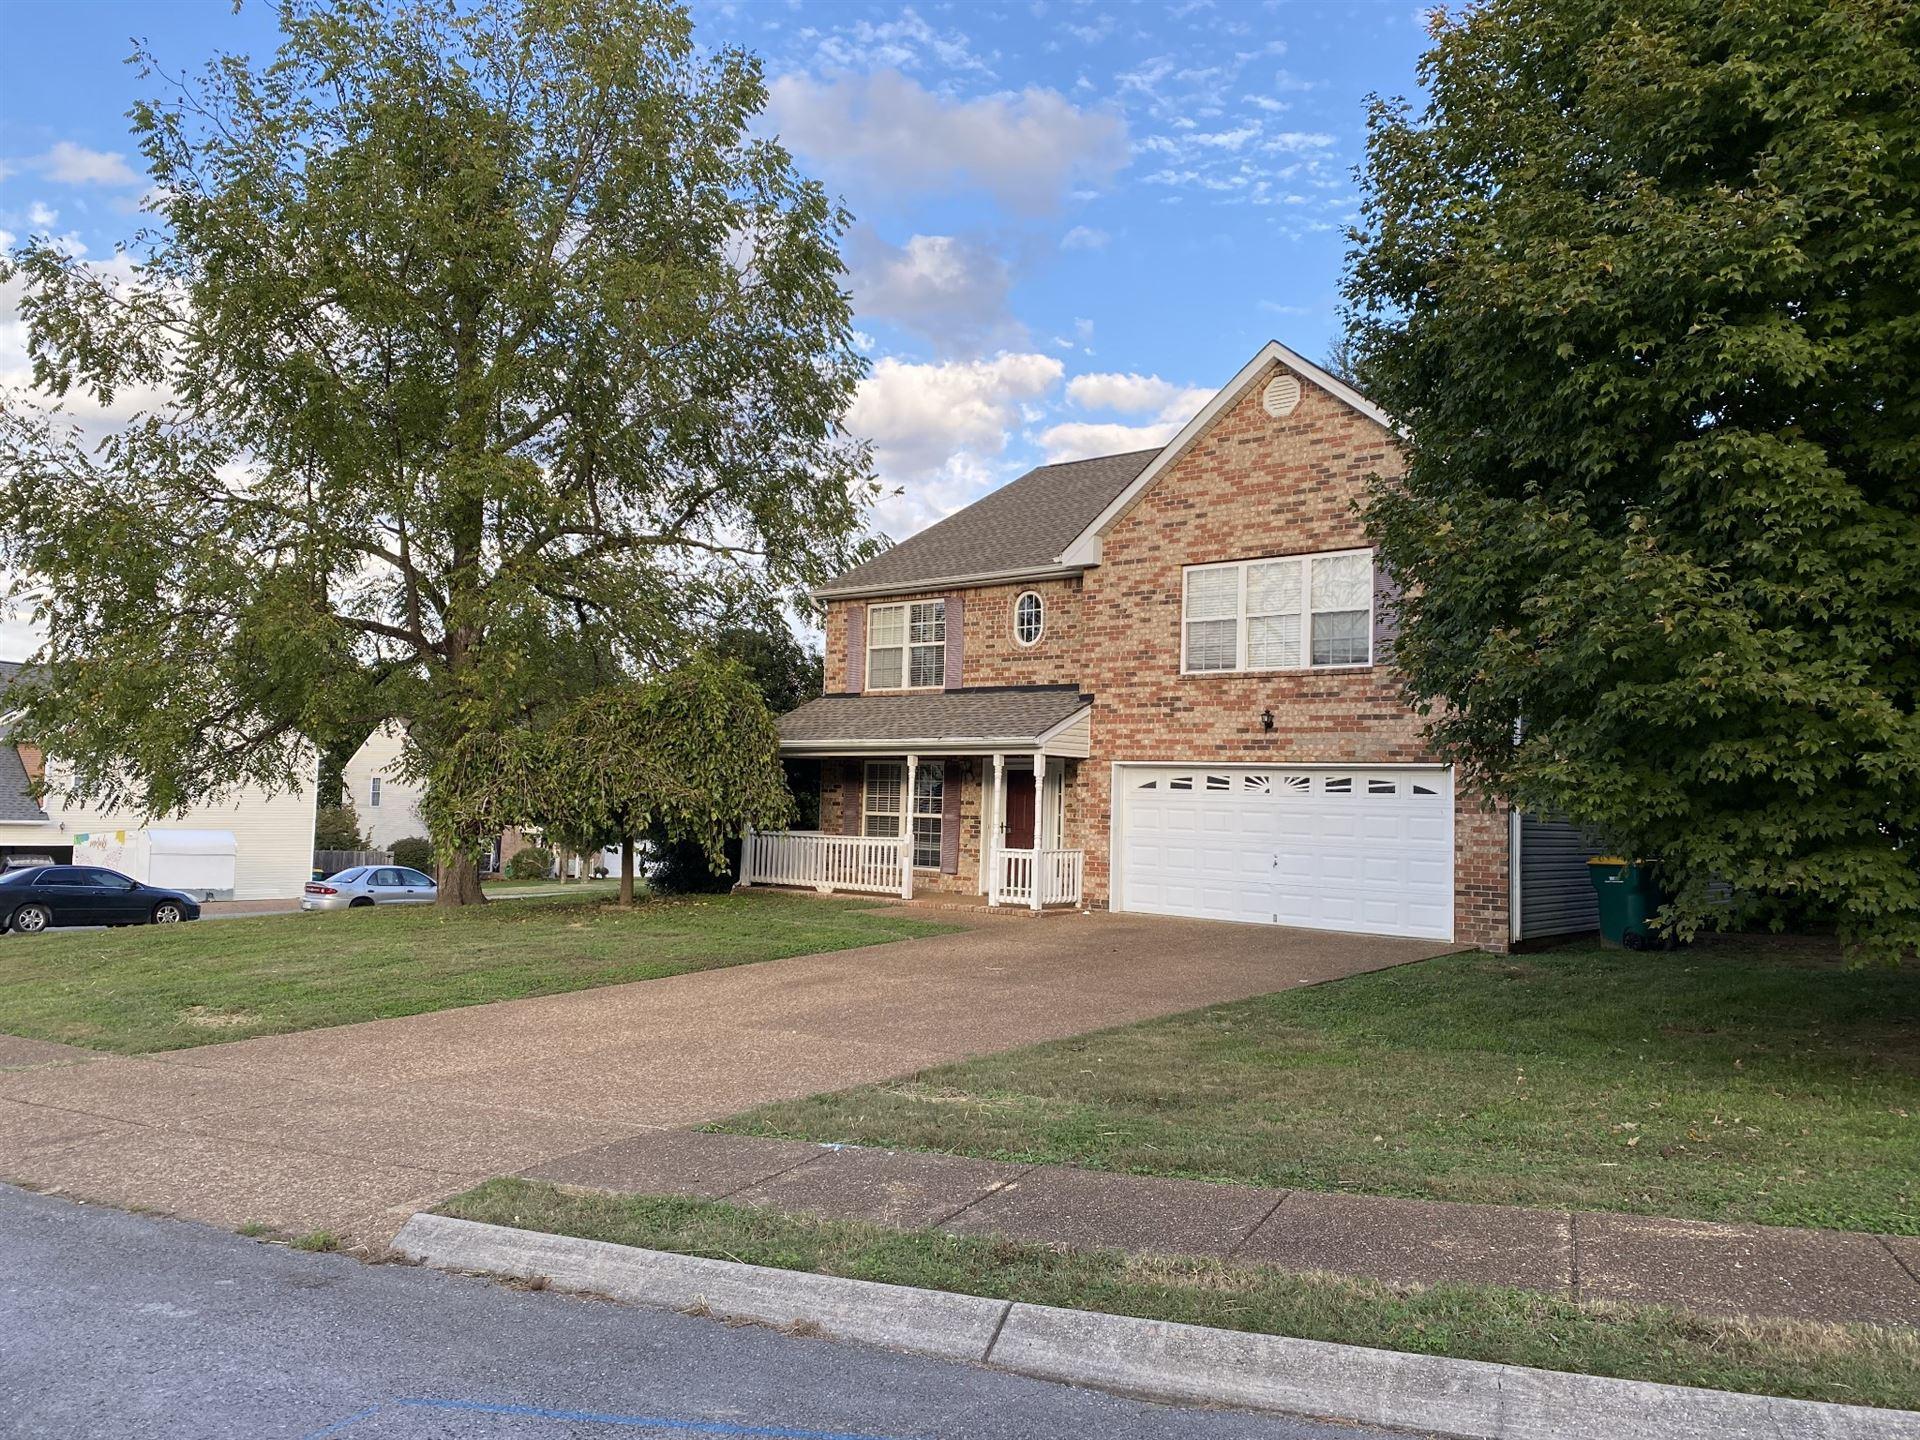 Photo of 2020 Trenton Dr, Spring Hill, TN 37174 (MLS # 2302173)